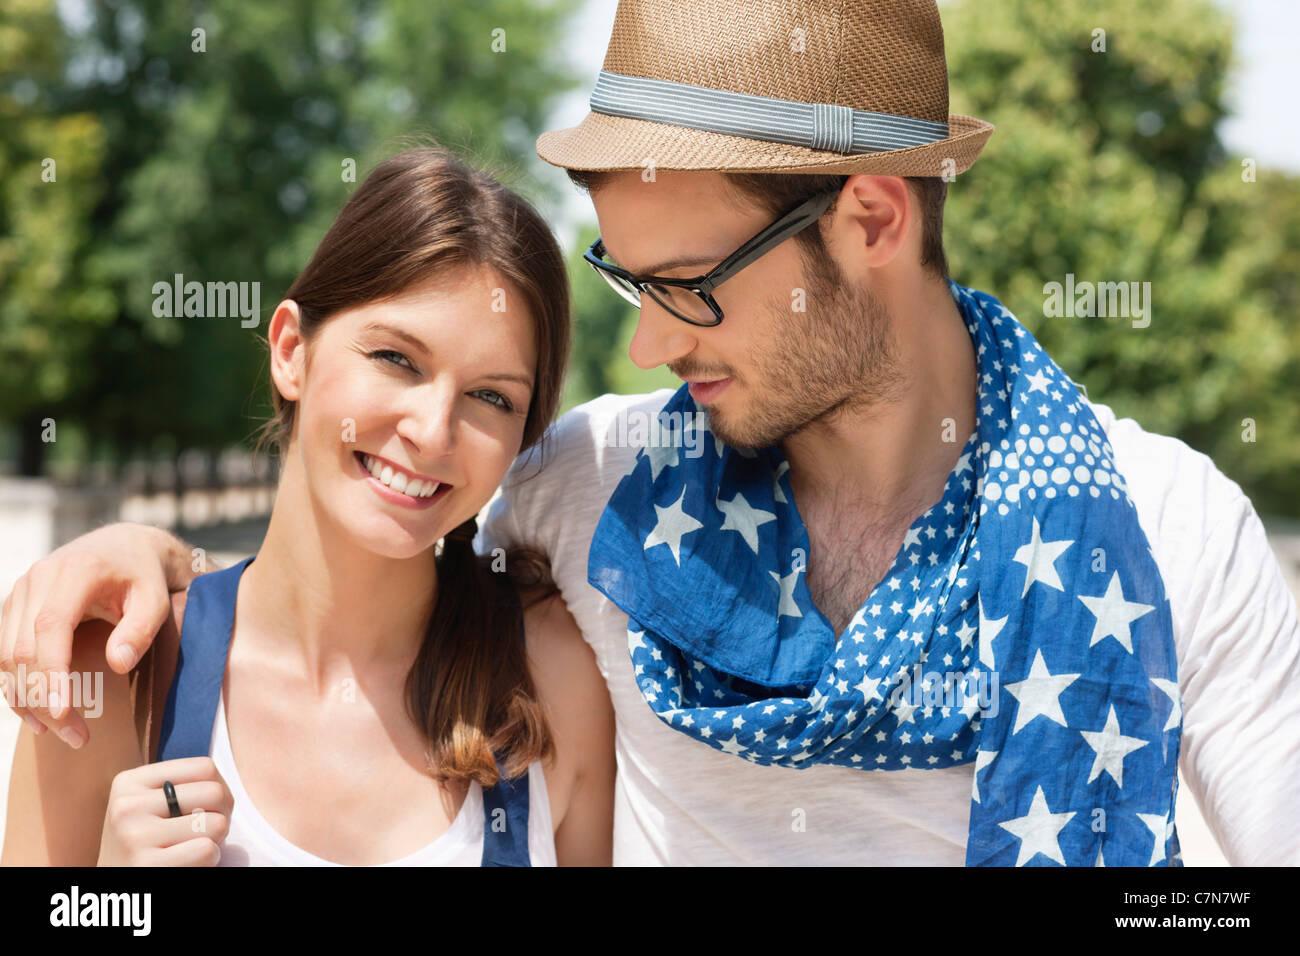 Man with his arm around a woman smiling, Paris, Ile-de-France, France - Stock Image